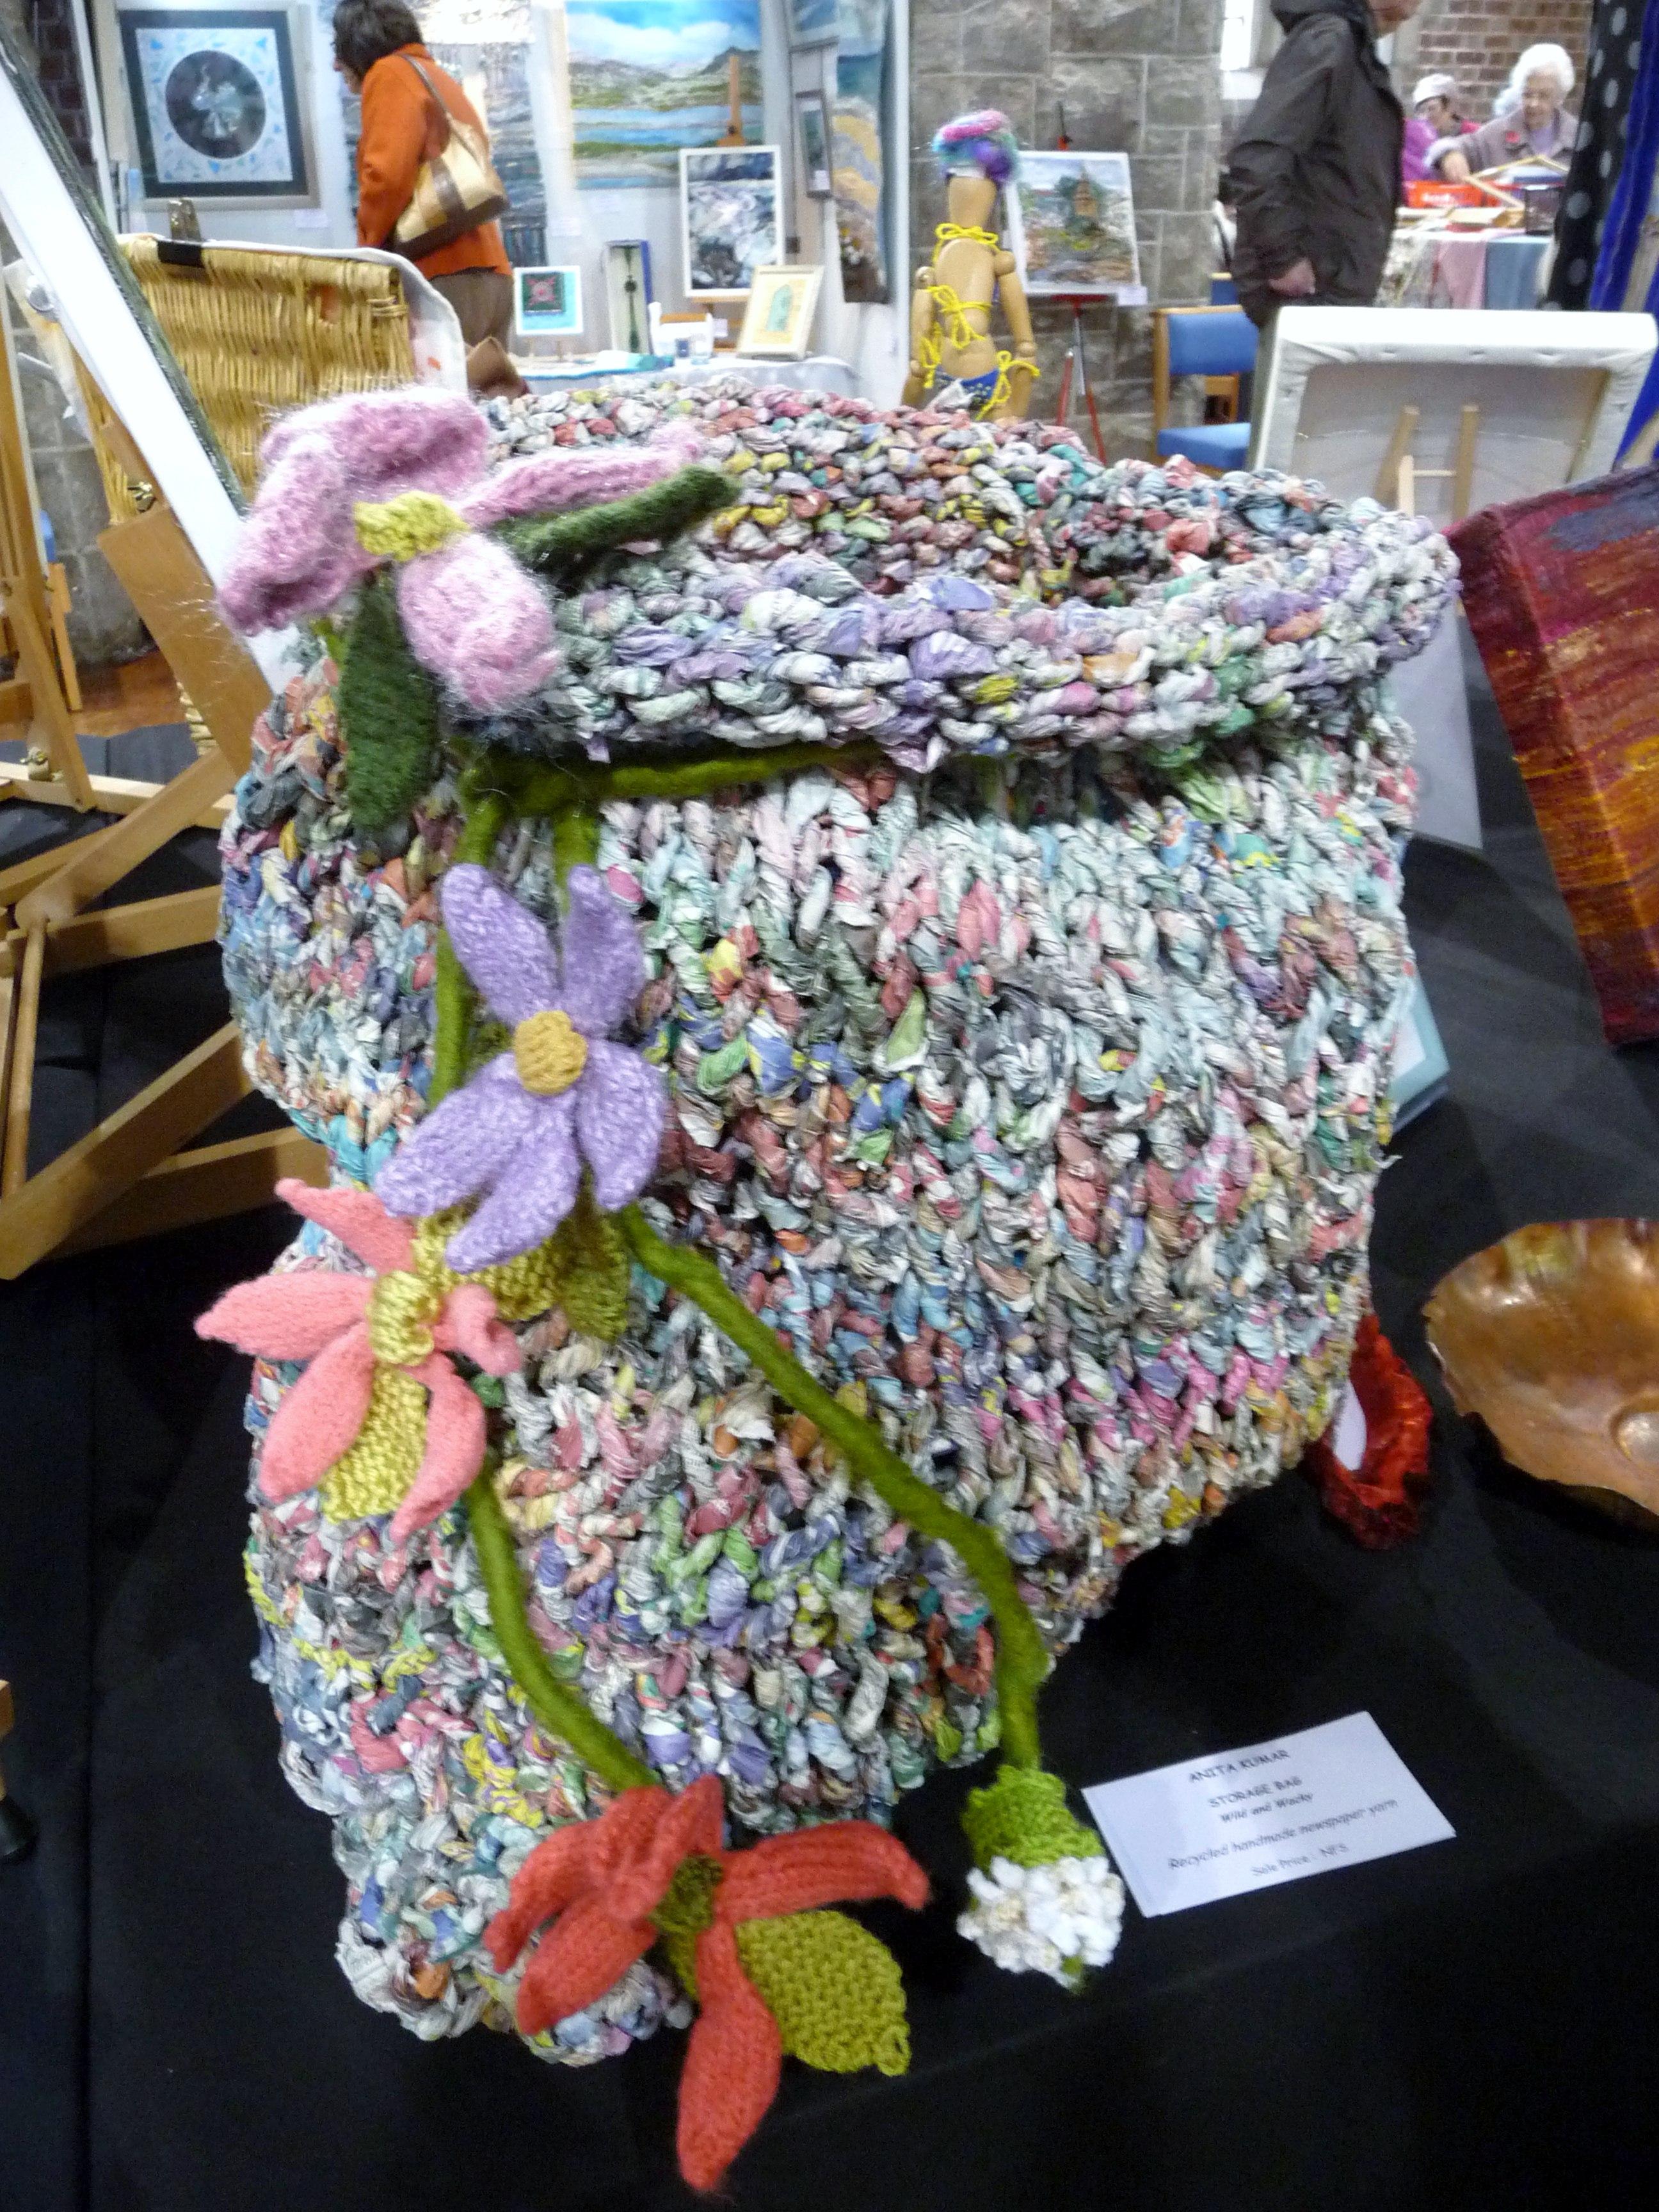 STORAGE BAG, Wild & Wacky, by Anita Kumar, recycled handmade newspaper yarn